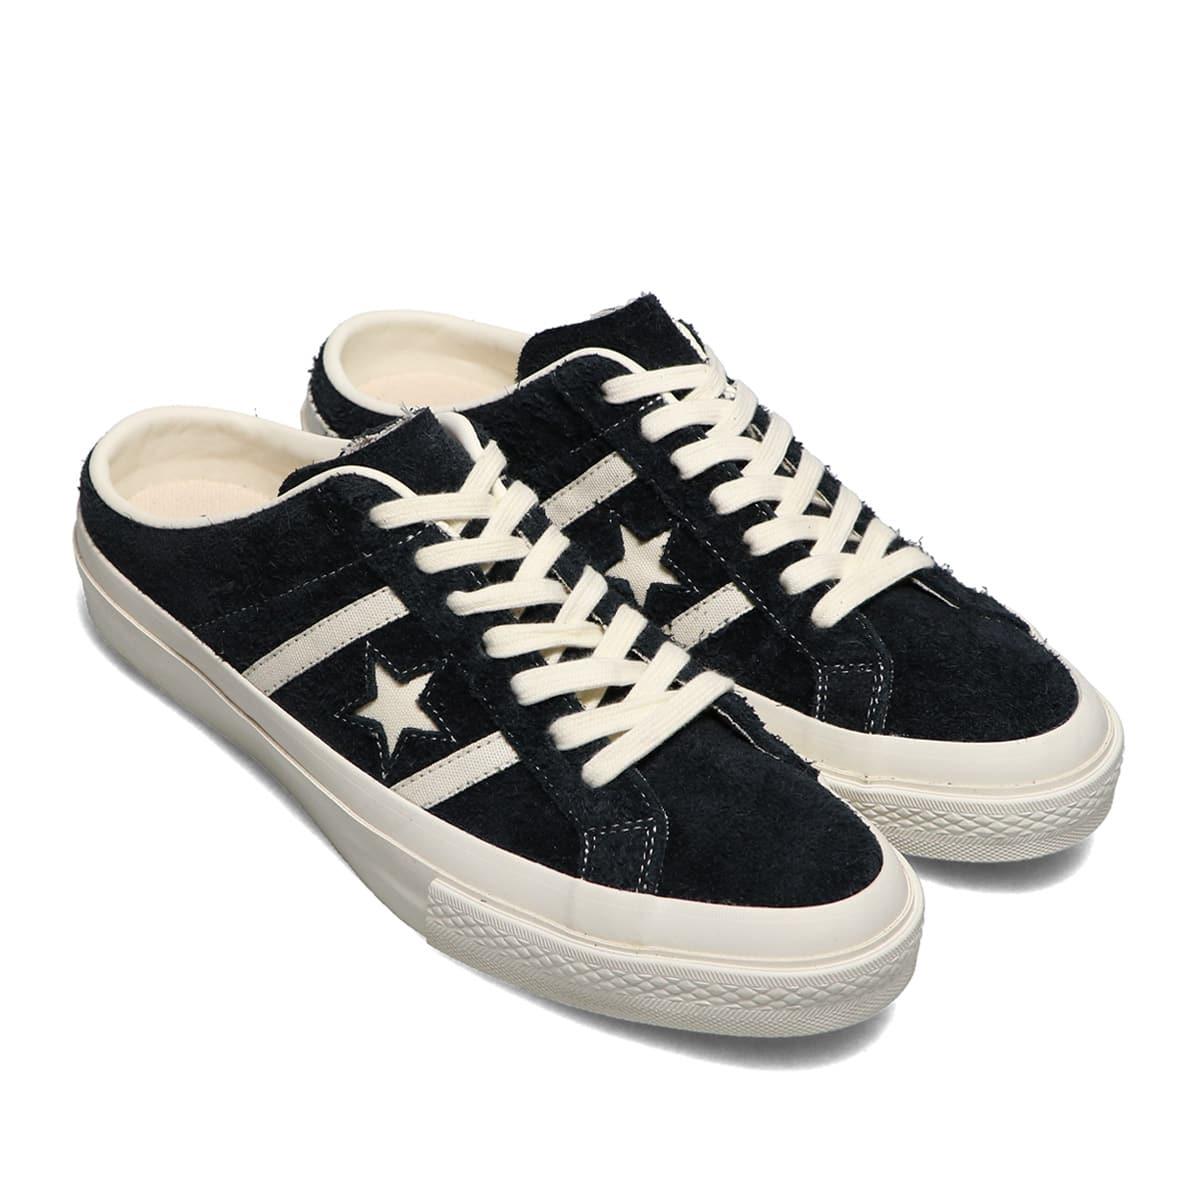 CONVERSE STAR&BARS CLOGS BLACK 21FW-I_photo_large